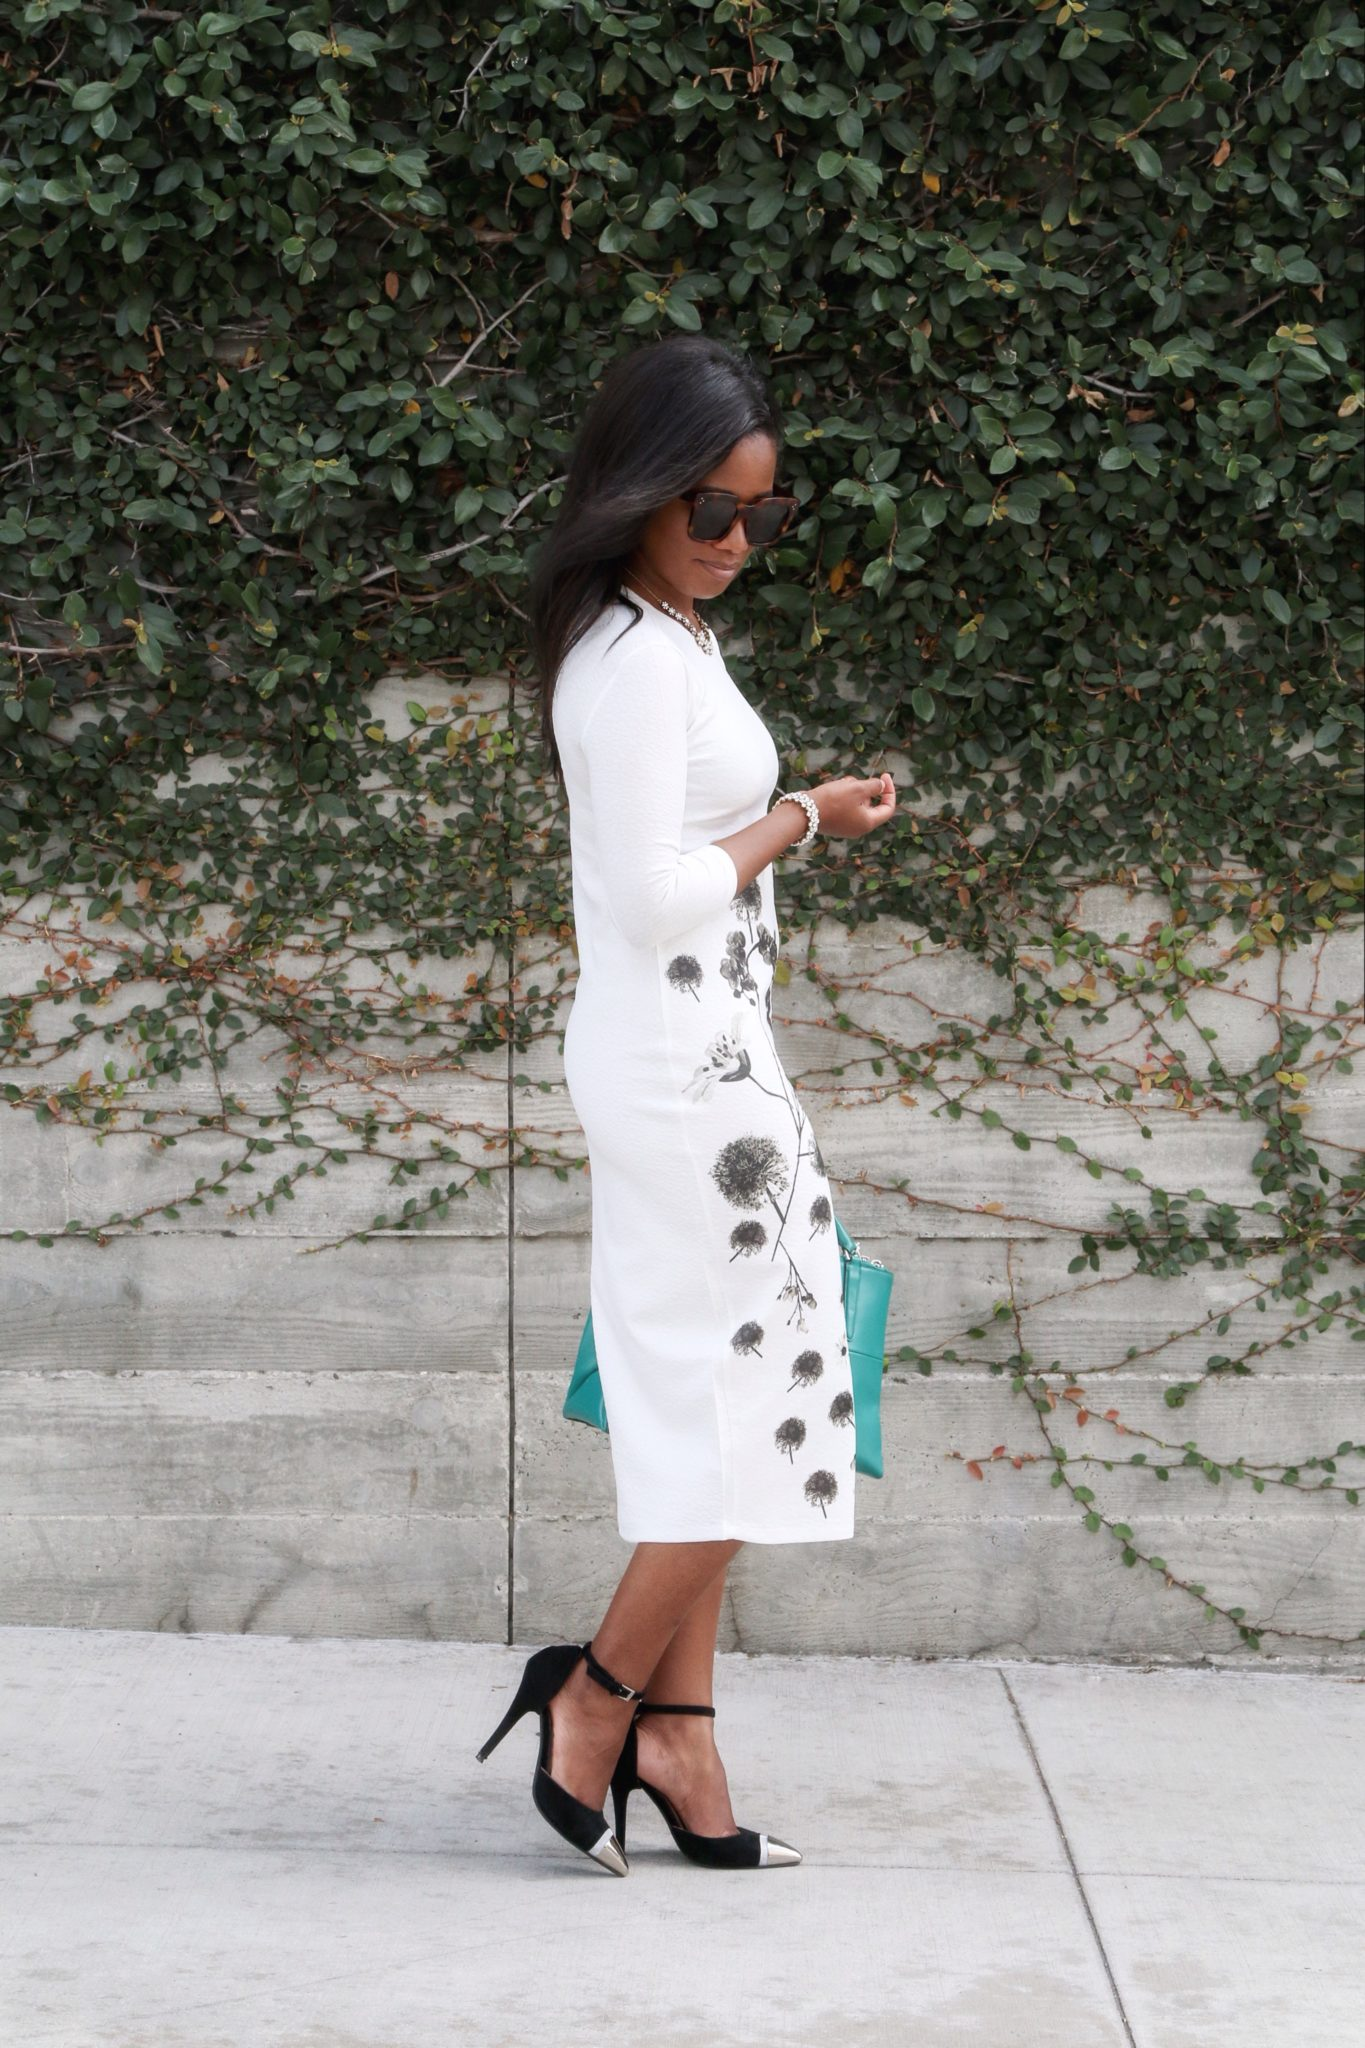 Downtown Demure x Go Modest - White Floral Dress 4